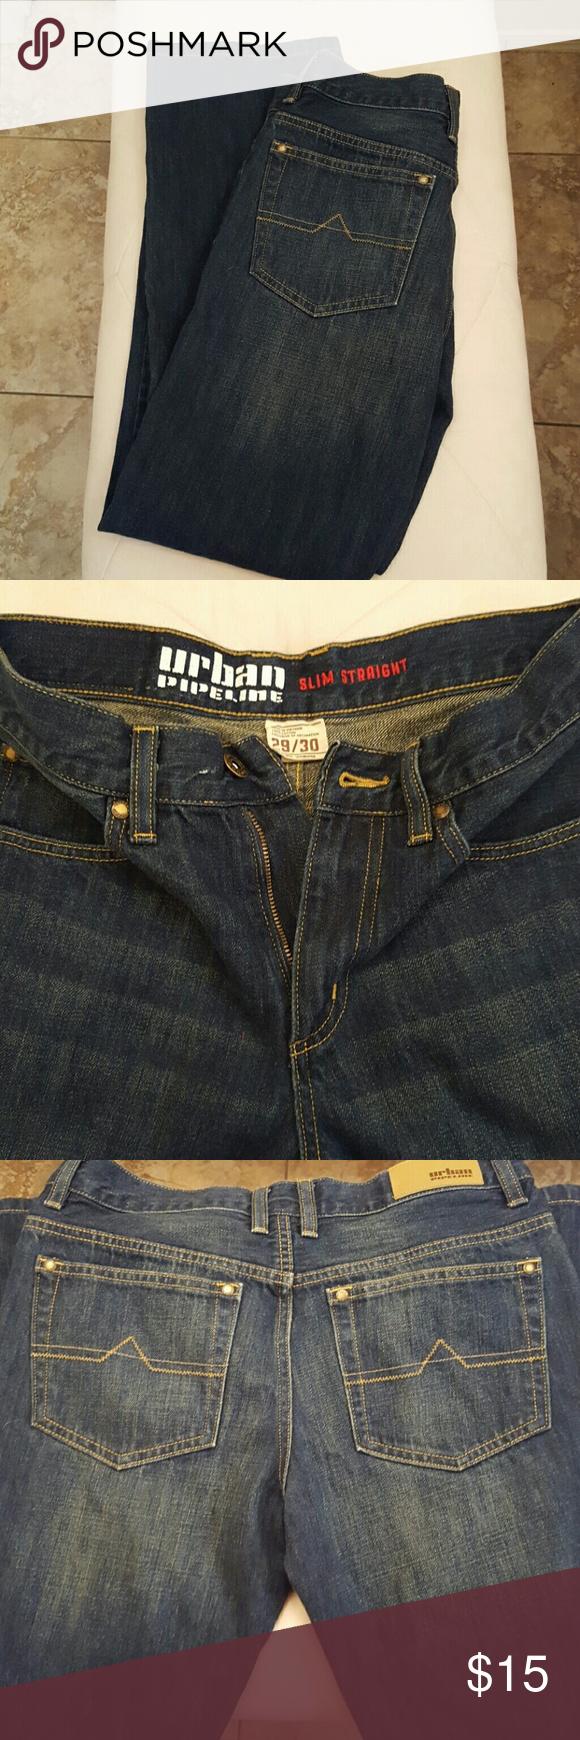 Teen/mens straight leg jeans NWOT   Piernas, Jeans y Oscuro